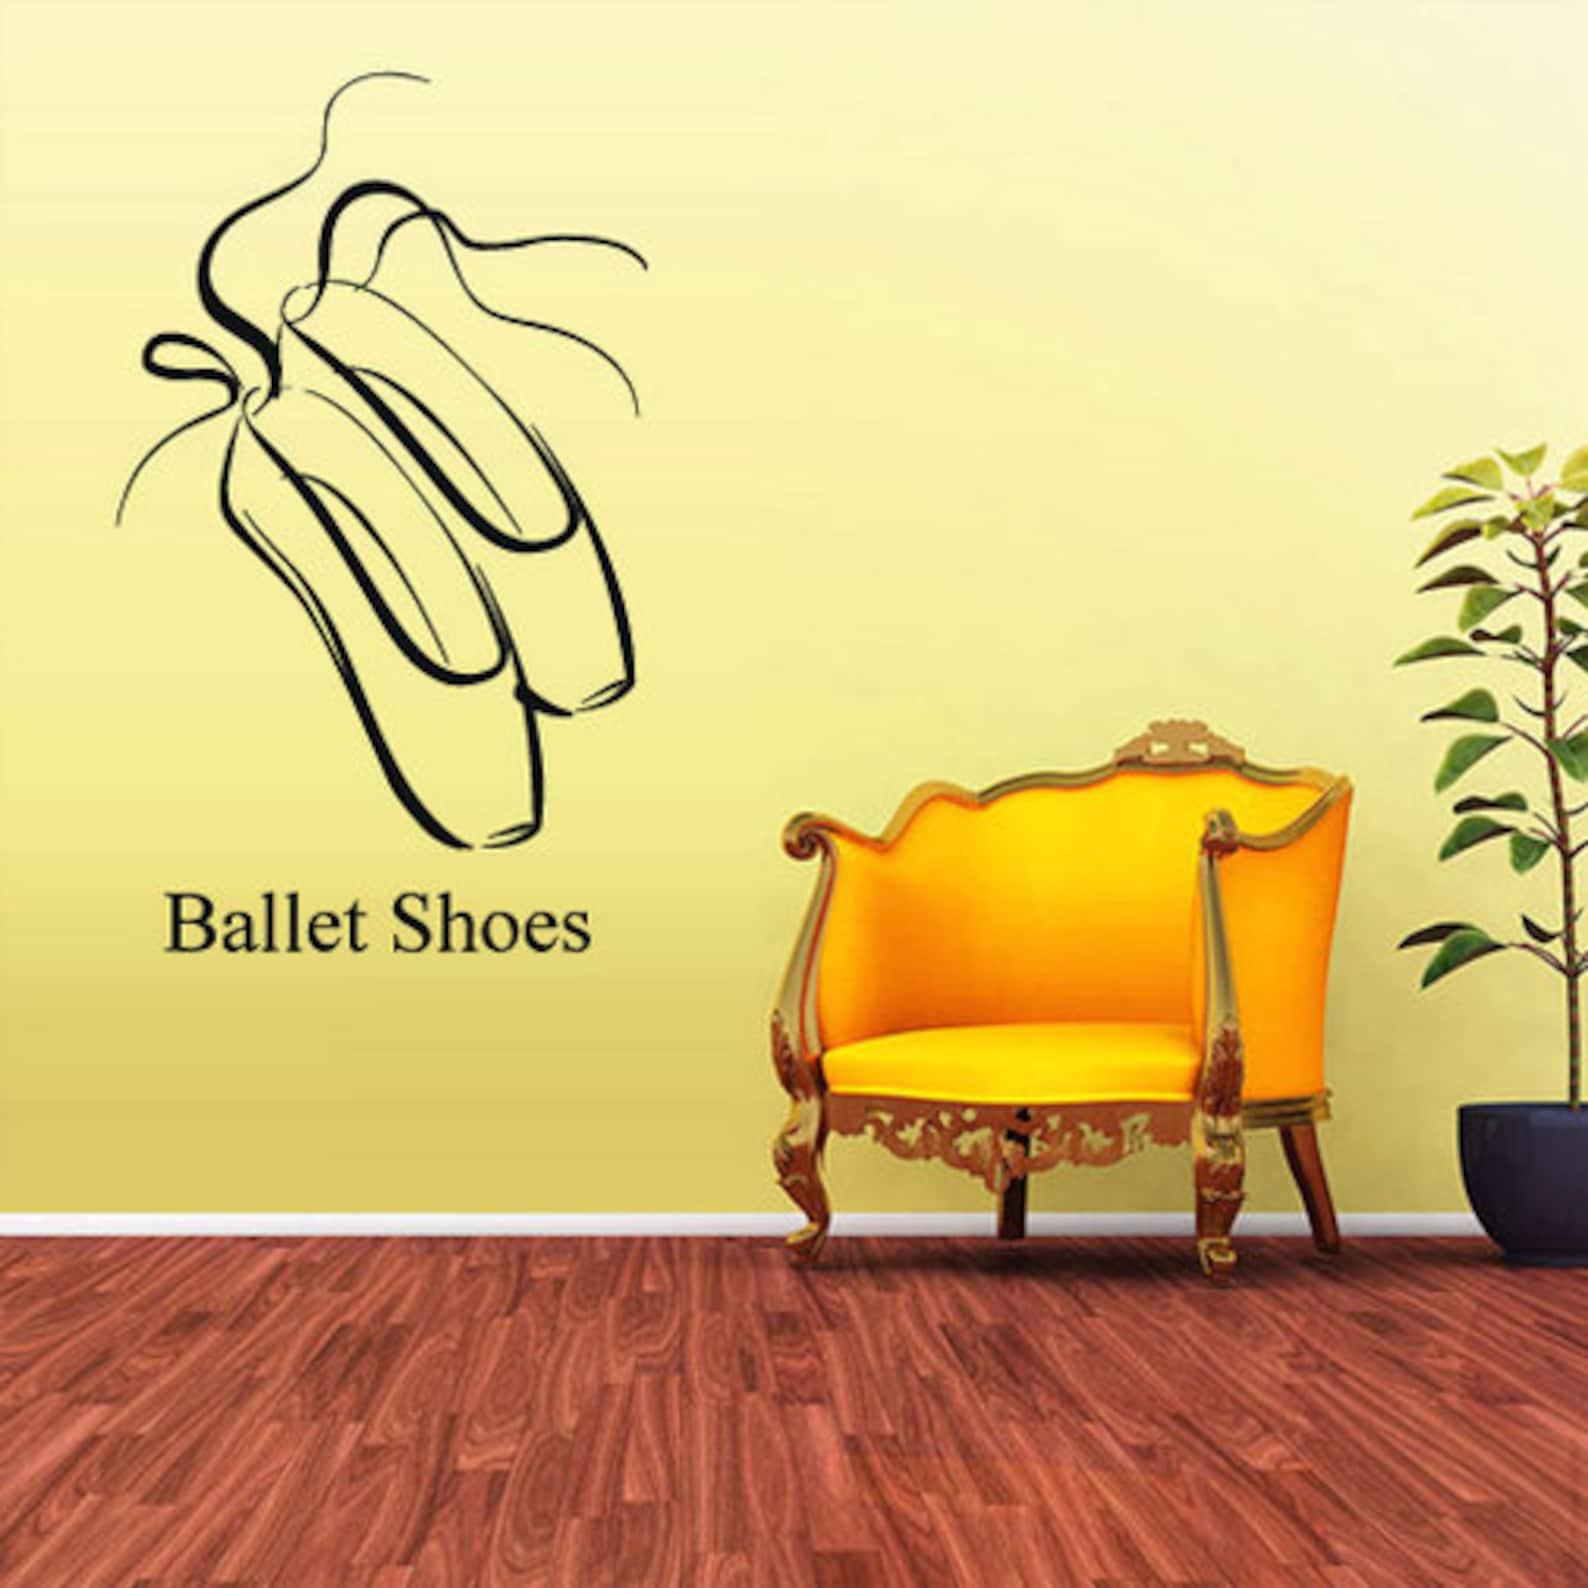 rvz1642 wall decal vinyl sticker decals ballerina ballet shoes dancer kids boys